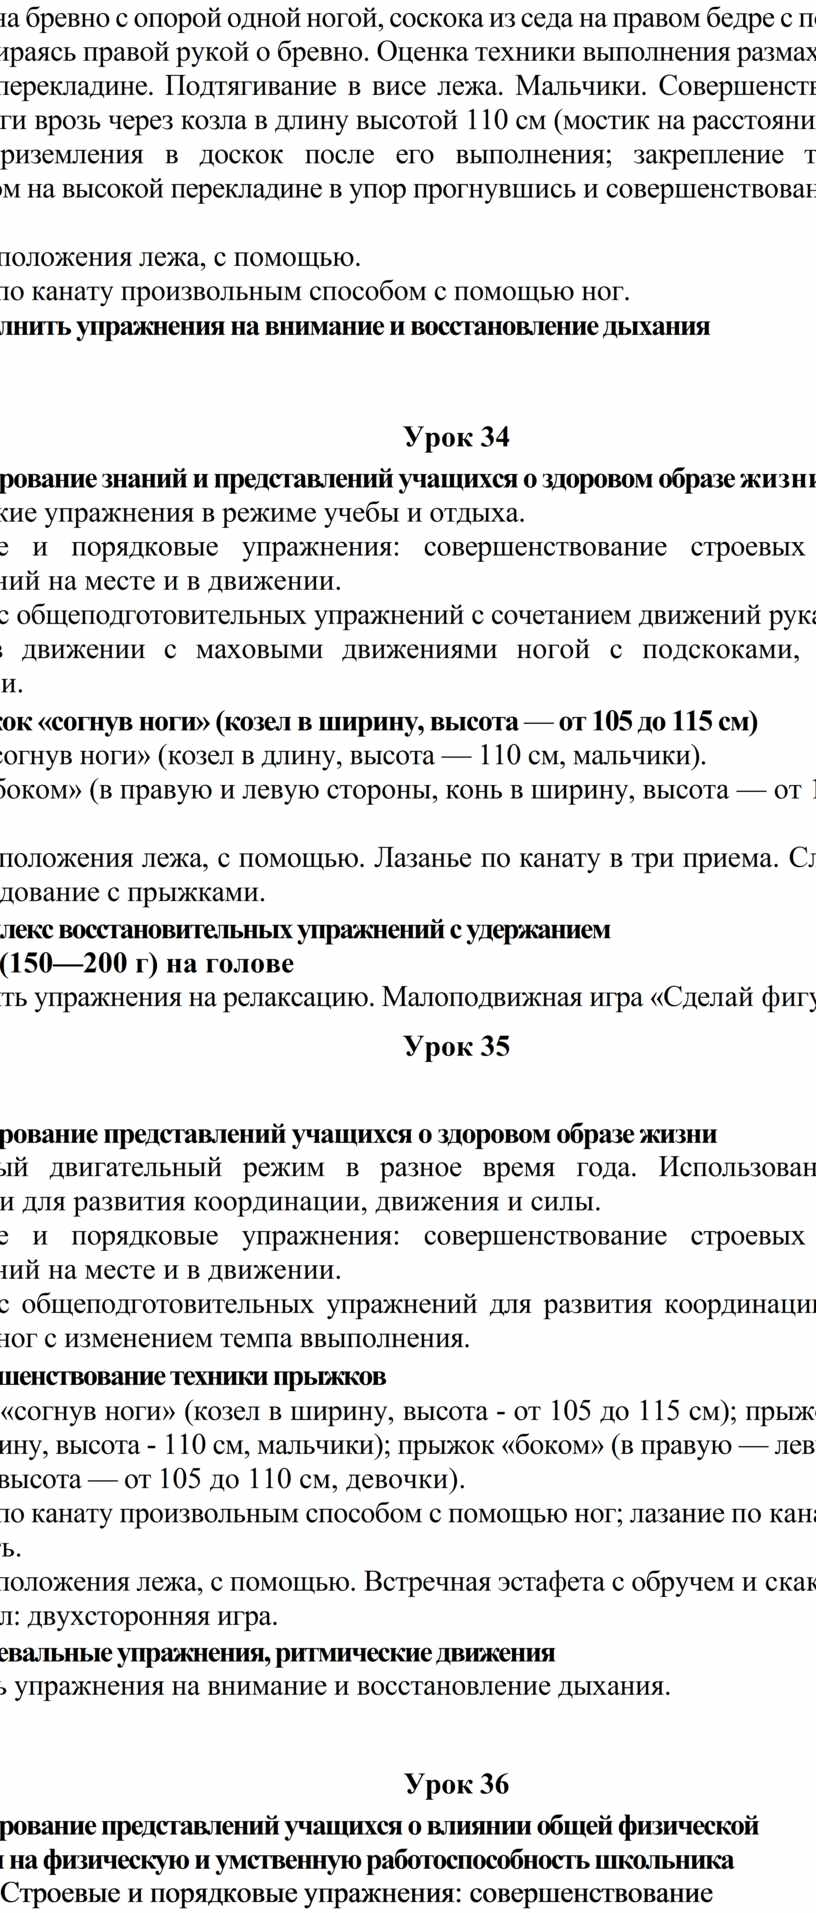 Оценка техники выполнения размахивания изгибами в висе на перекладине